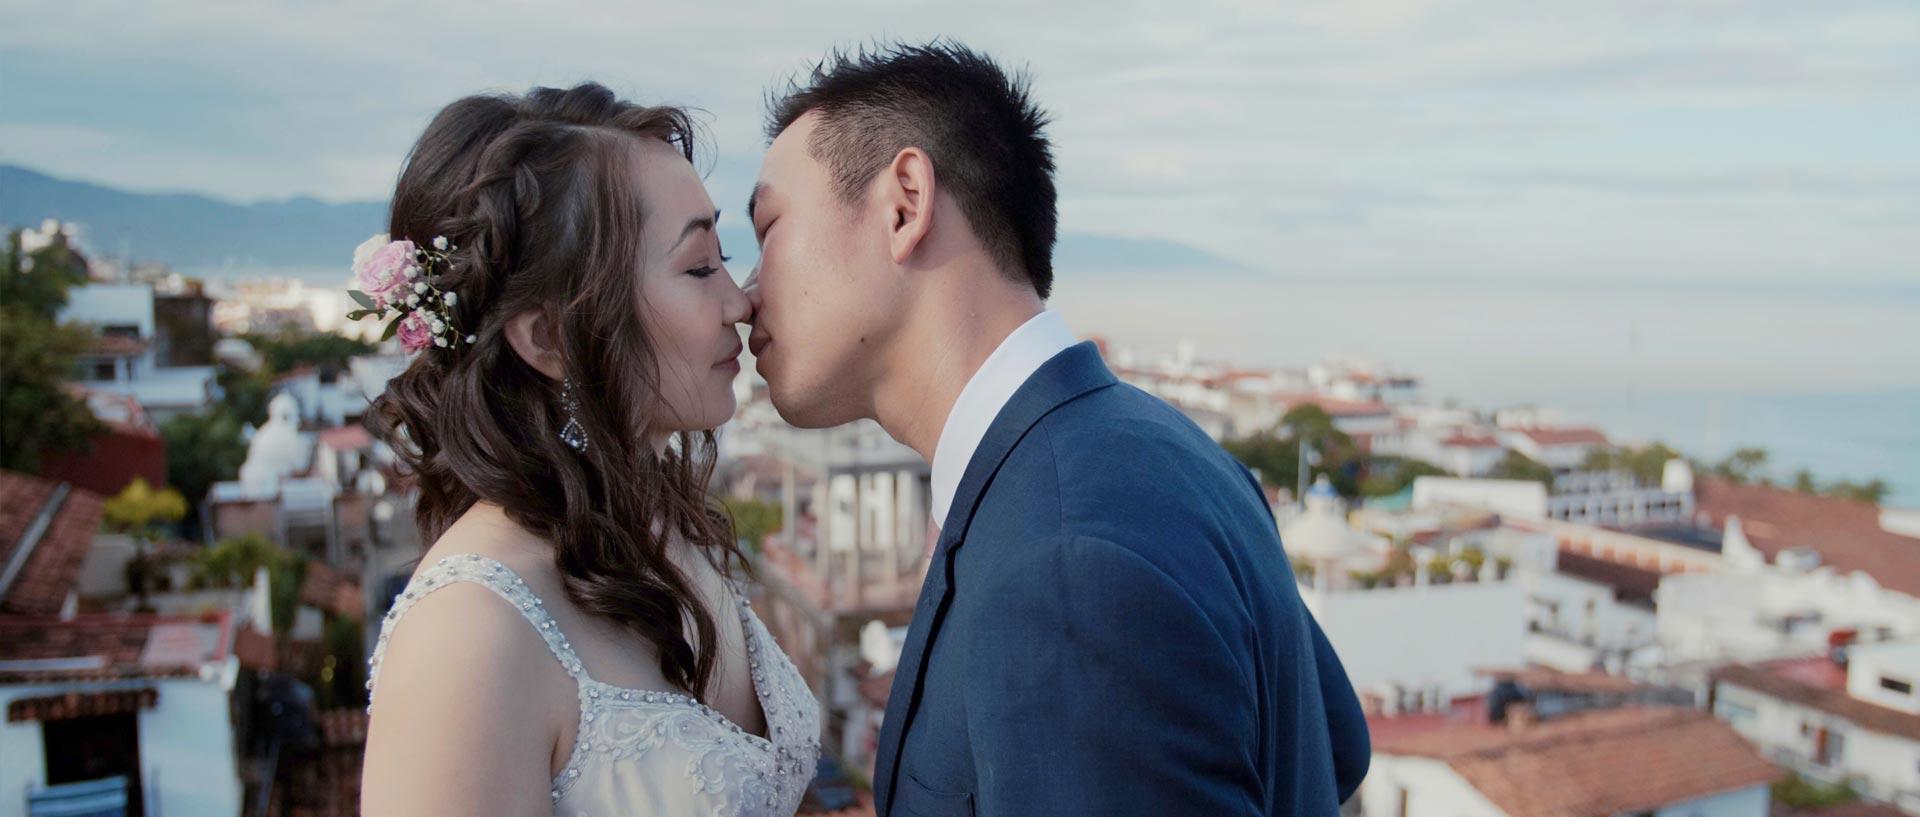 Peruto-Vallarta-Mexico-Destination-Wedding-Videography